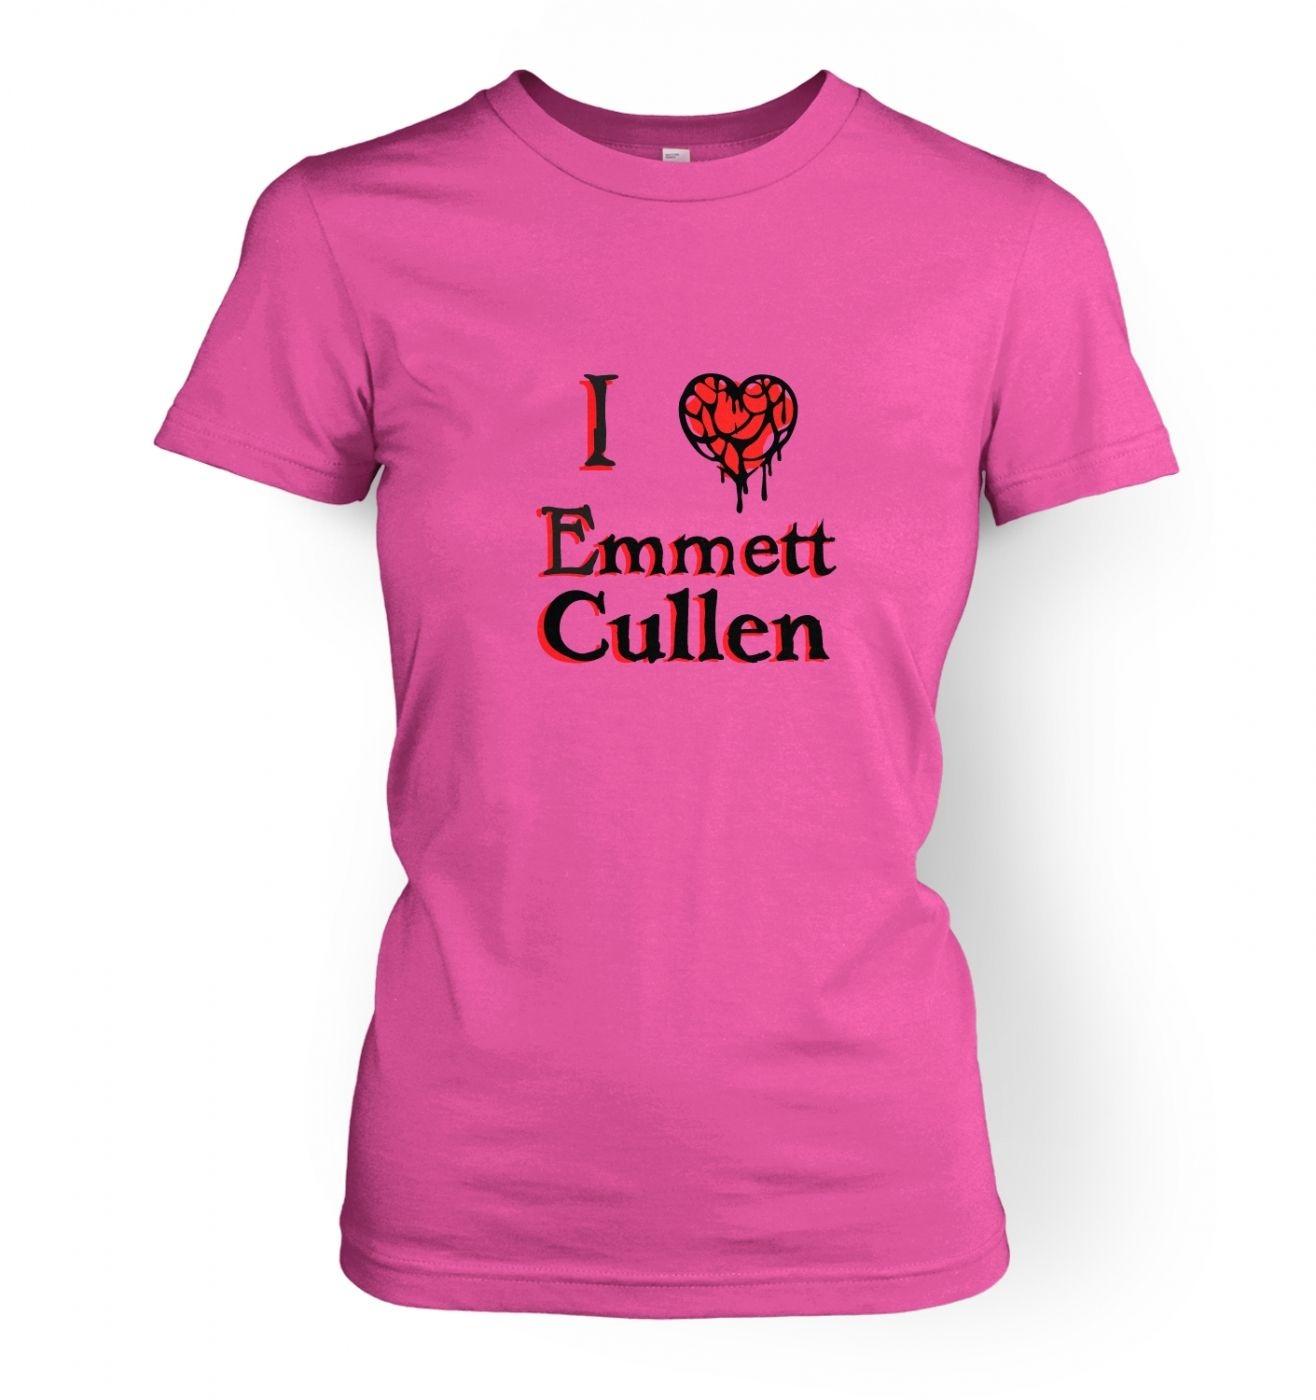 Women's I heart Emmett Cullen t-shirt - Inspired by Twilight